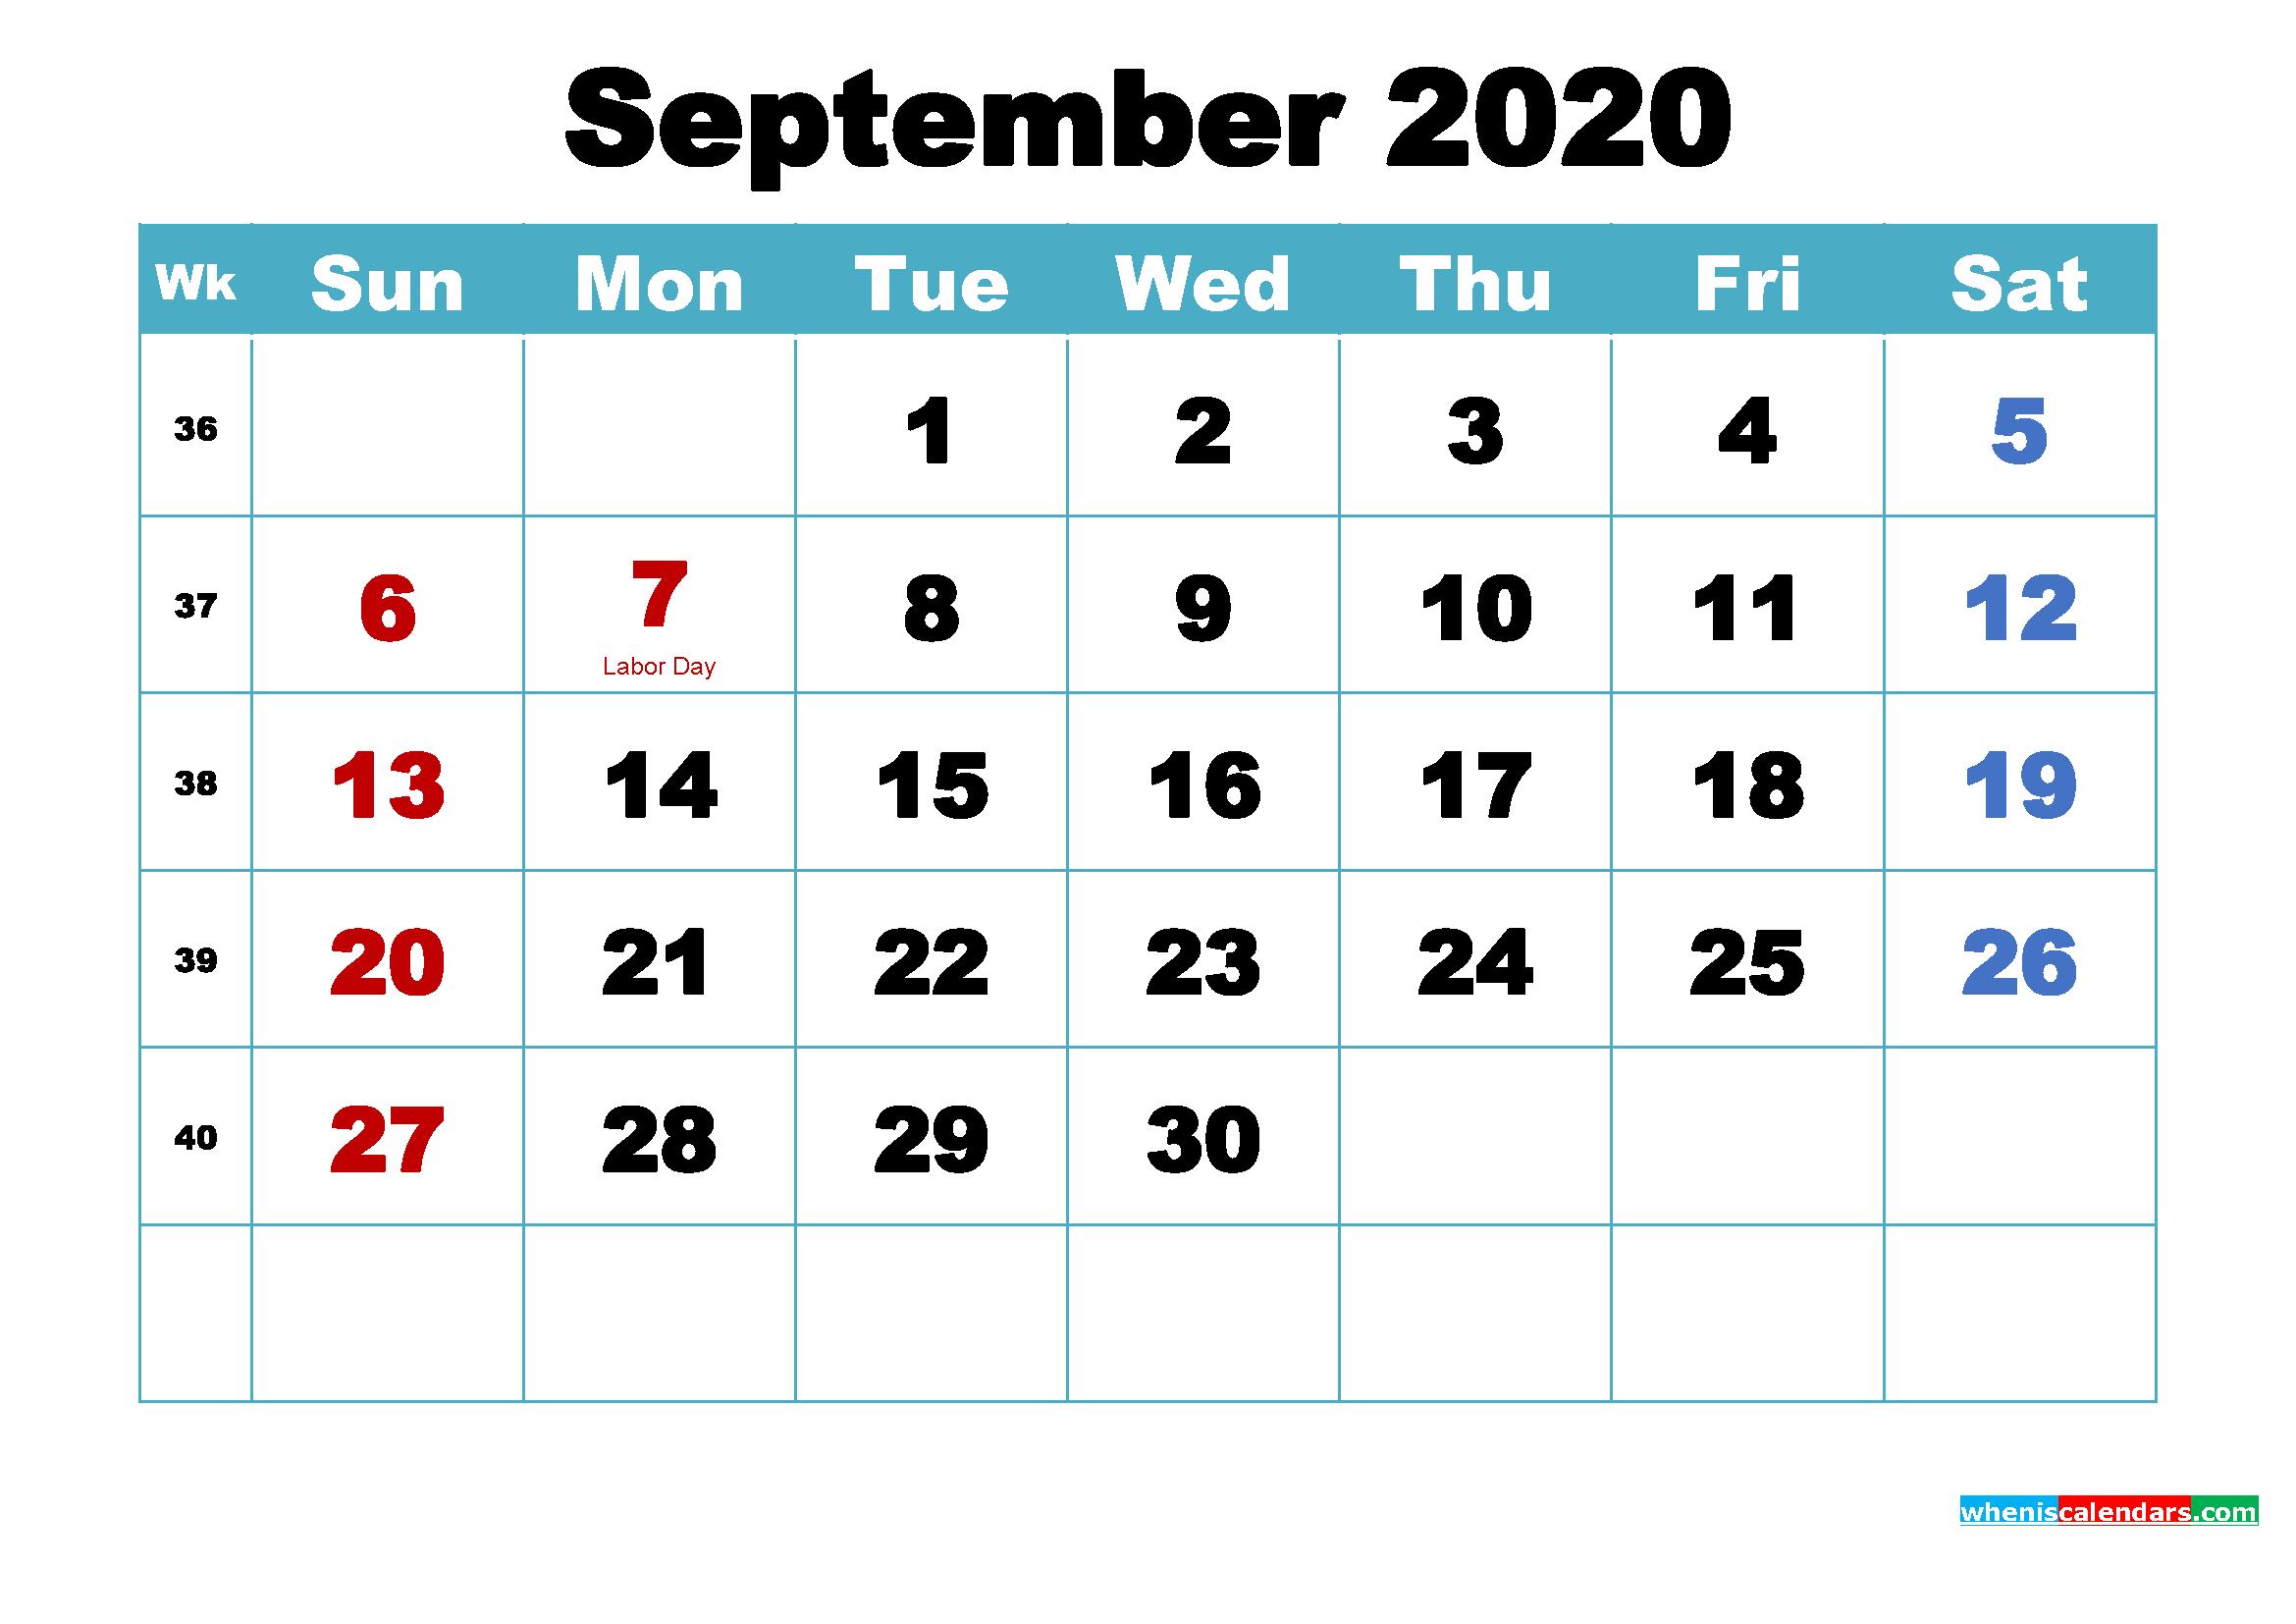 Printable September 2020 Calendar by Month